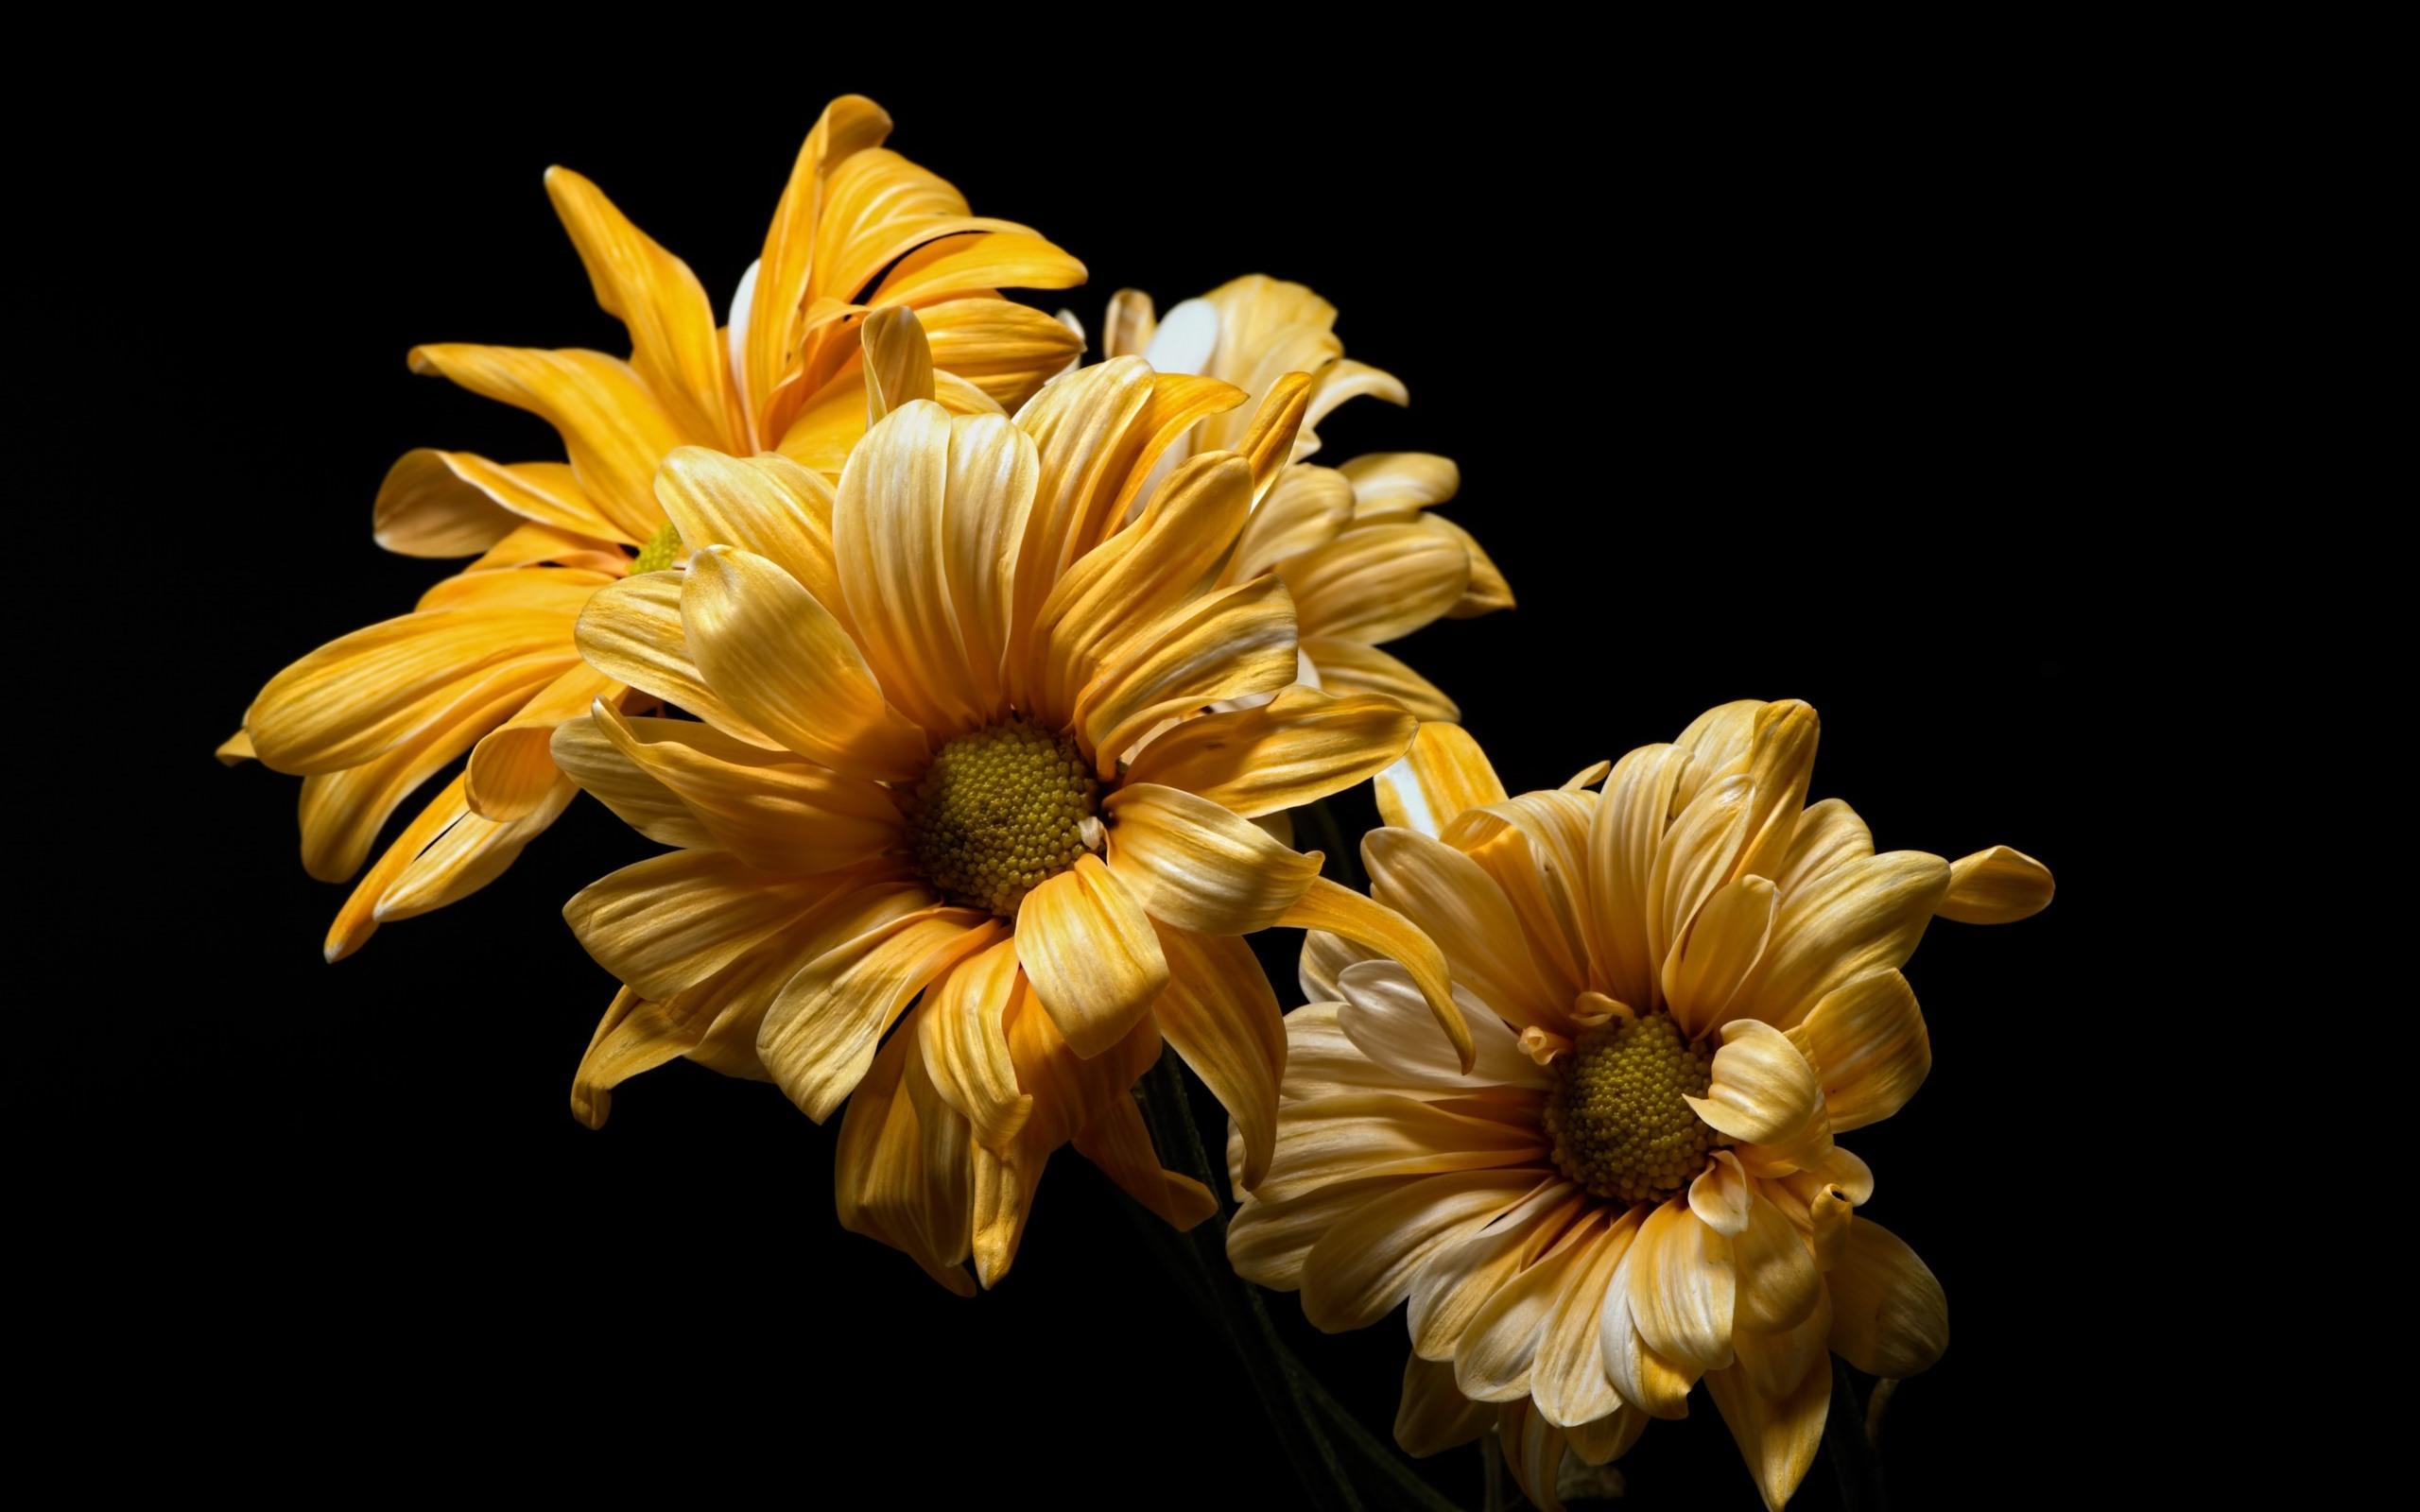 Fondos De Pantalla Primer Plano De Flores Amarillas Fondo Negro